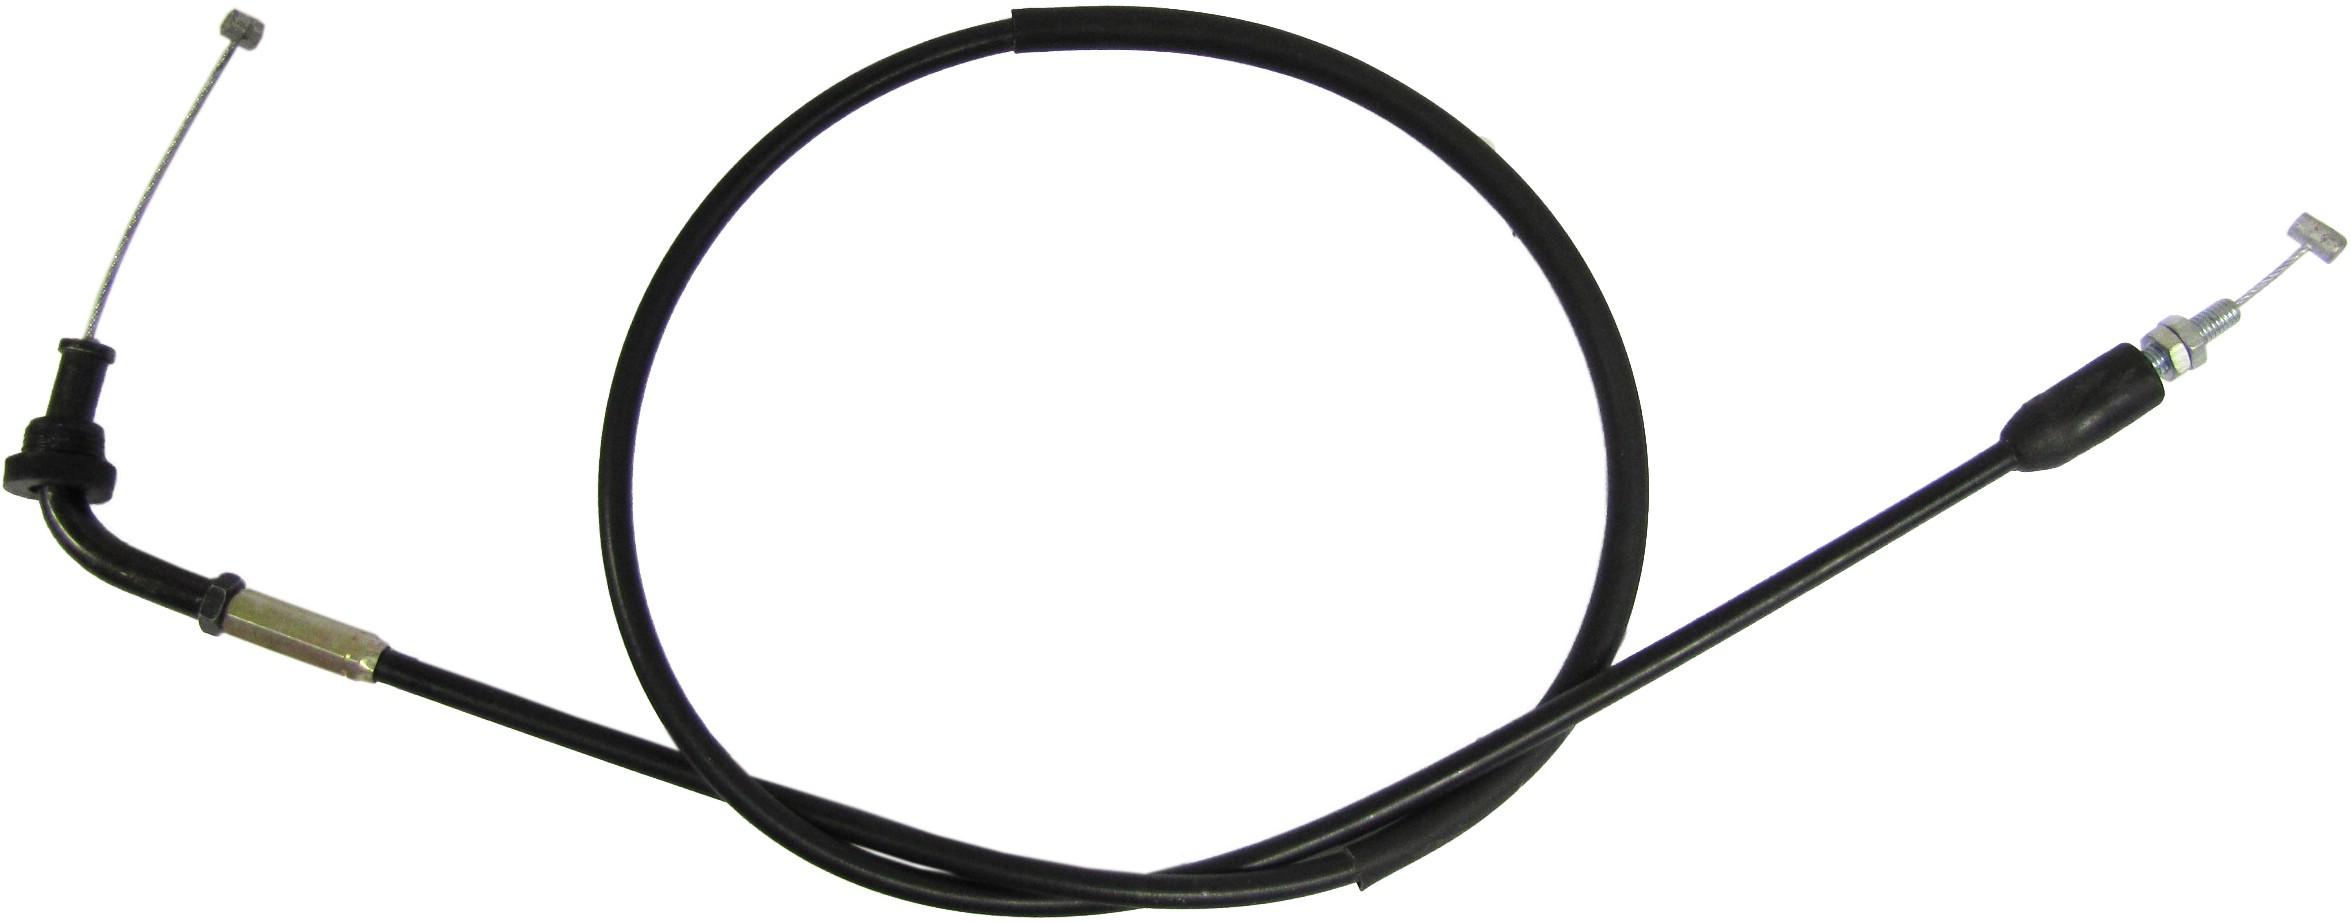 Suzuki GS 1000 G (Shaft) (USA) 1980-1981 Throttle Cable or